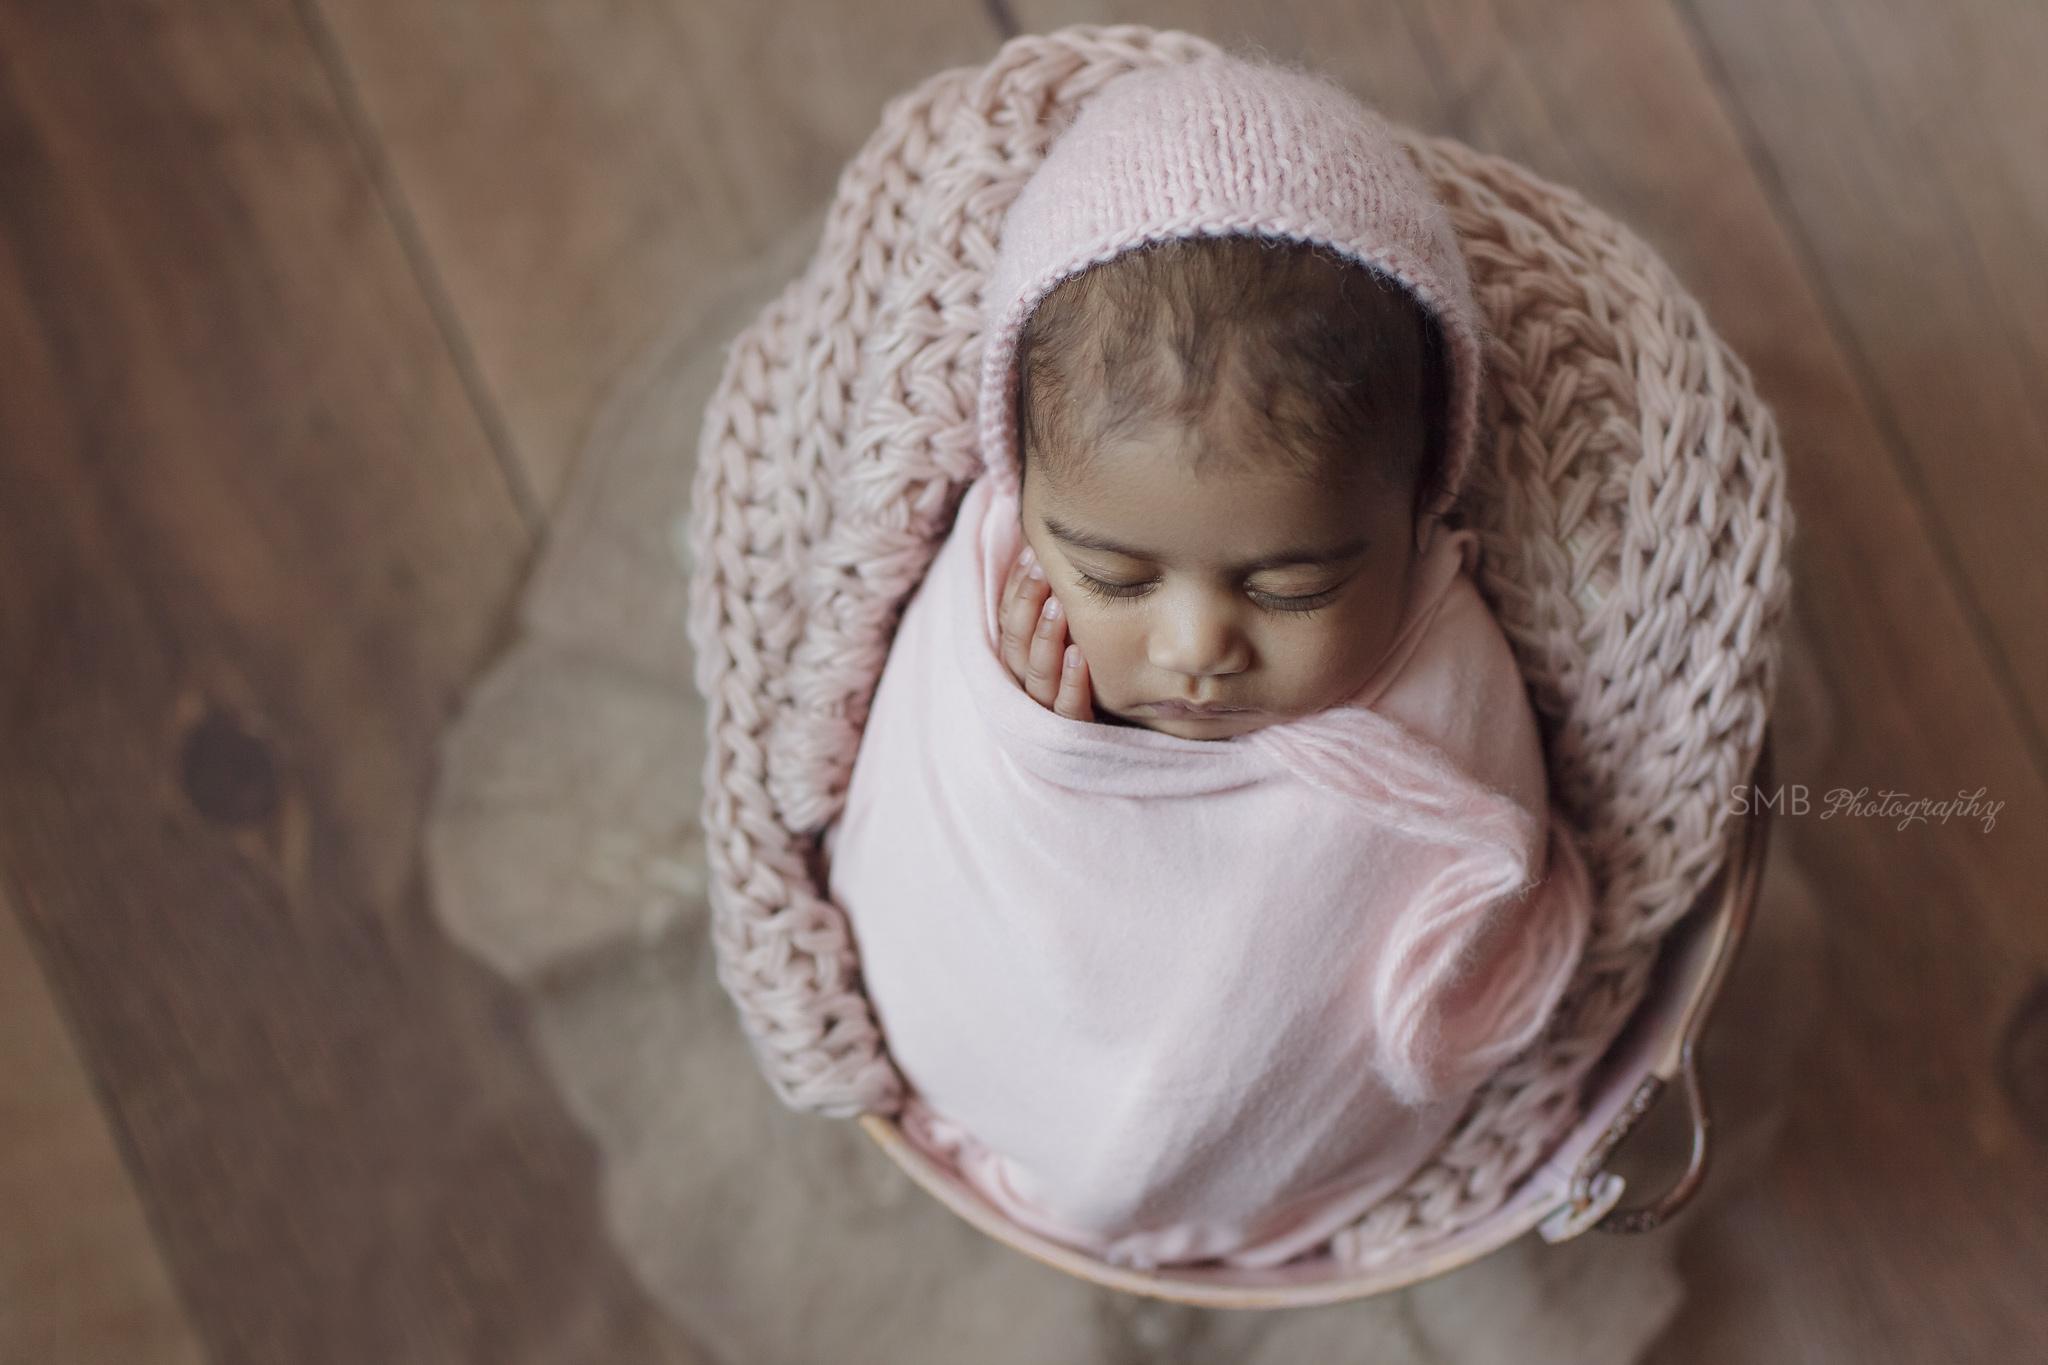 Baby girl wearing a pink bonnet